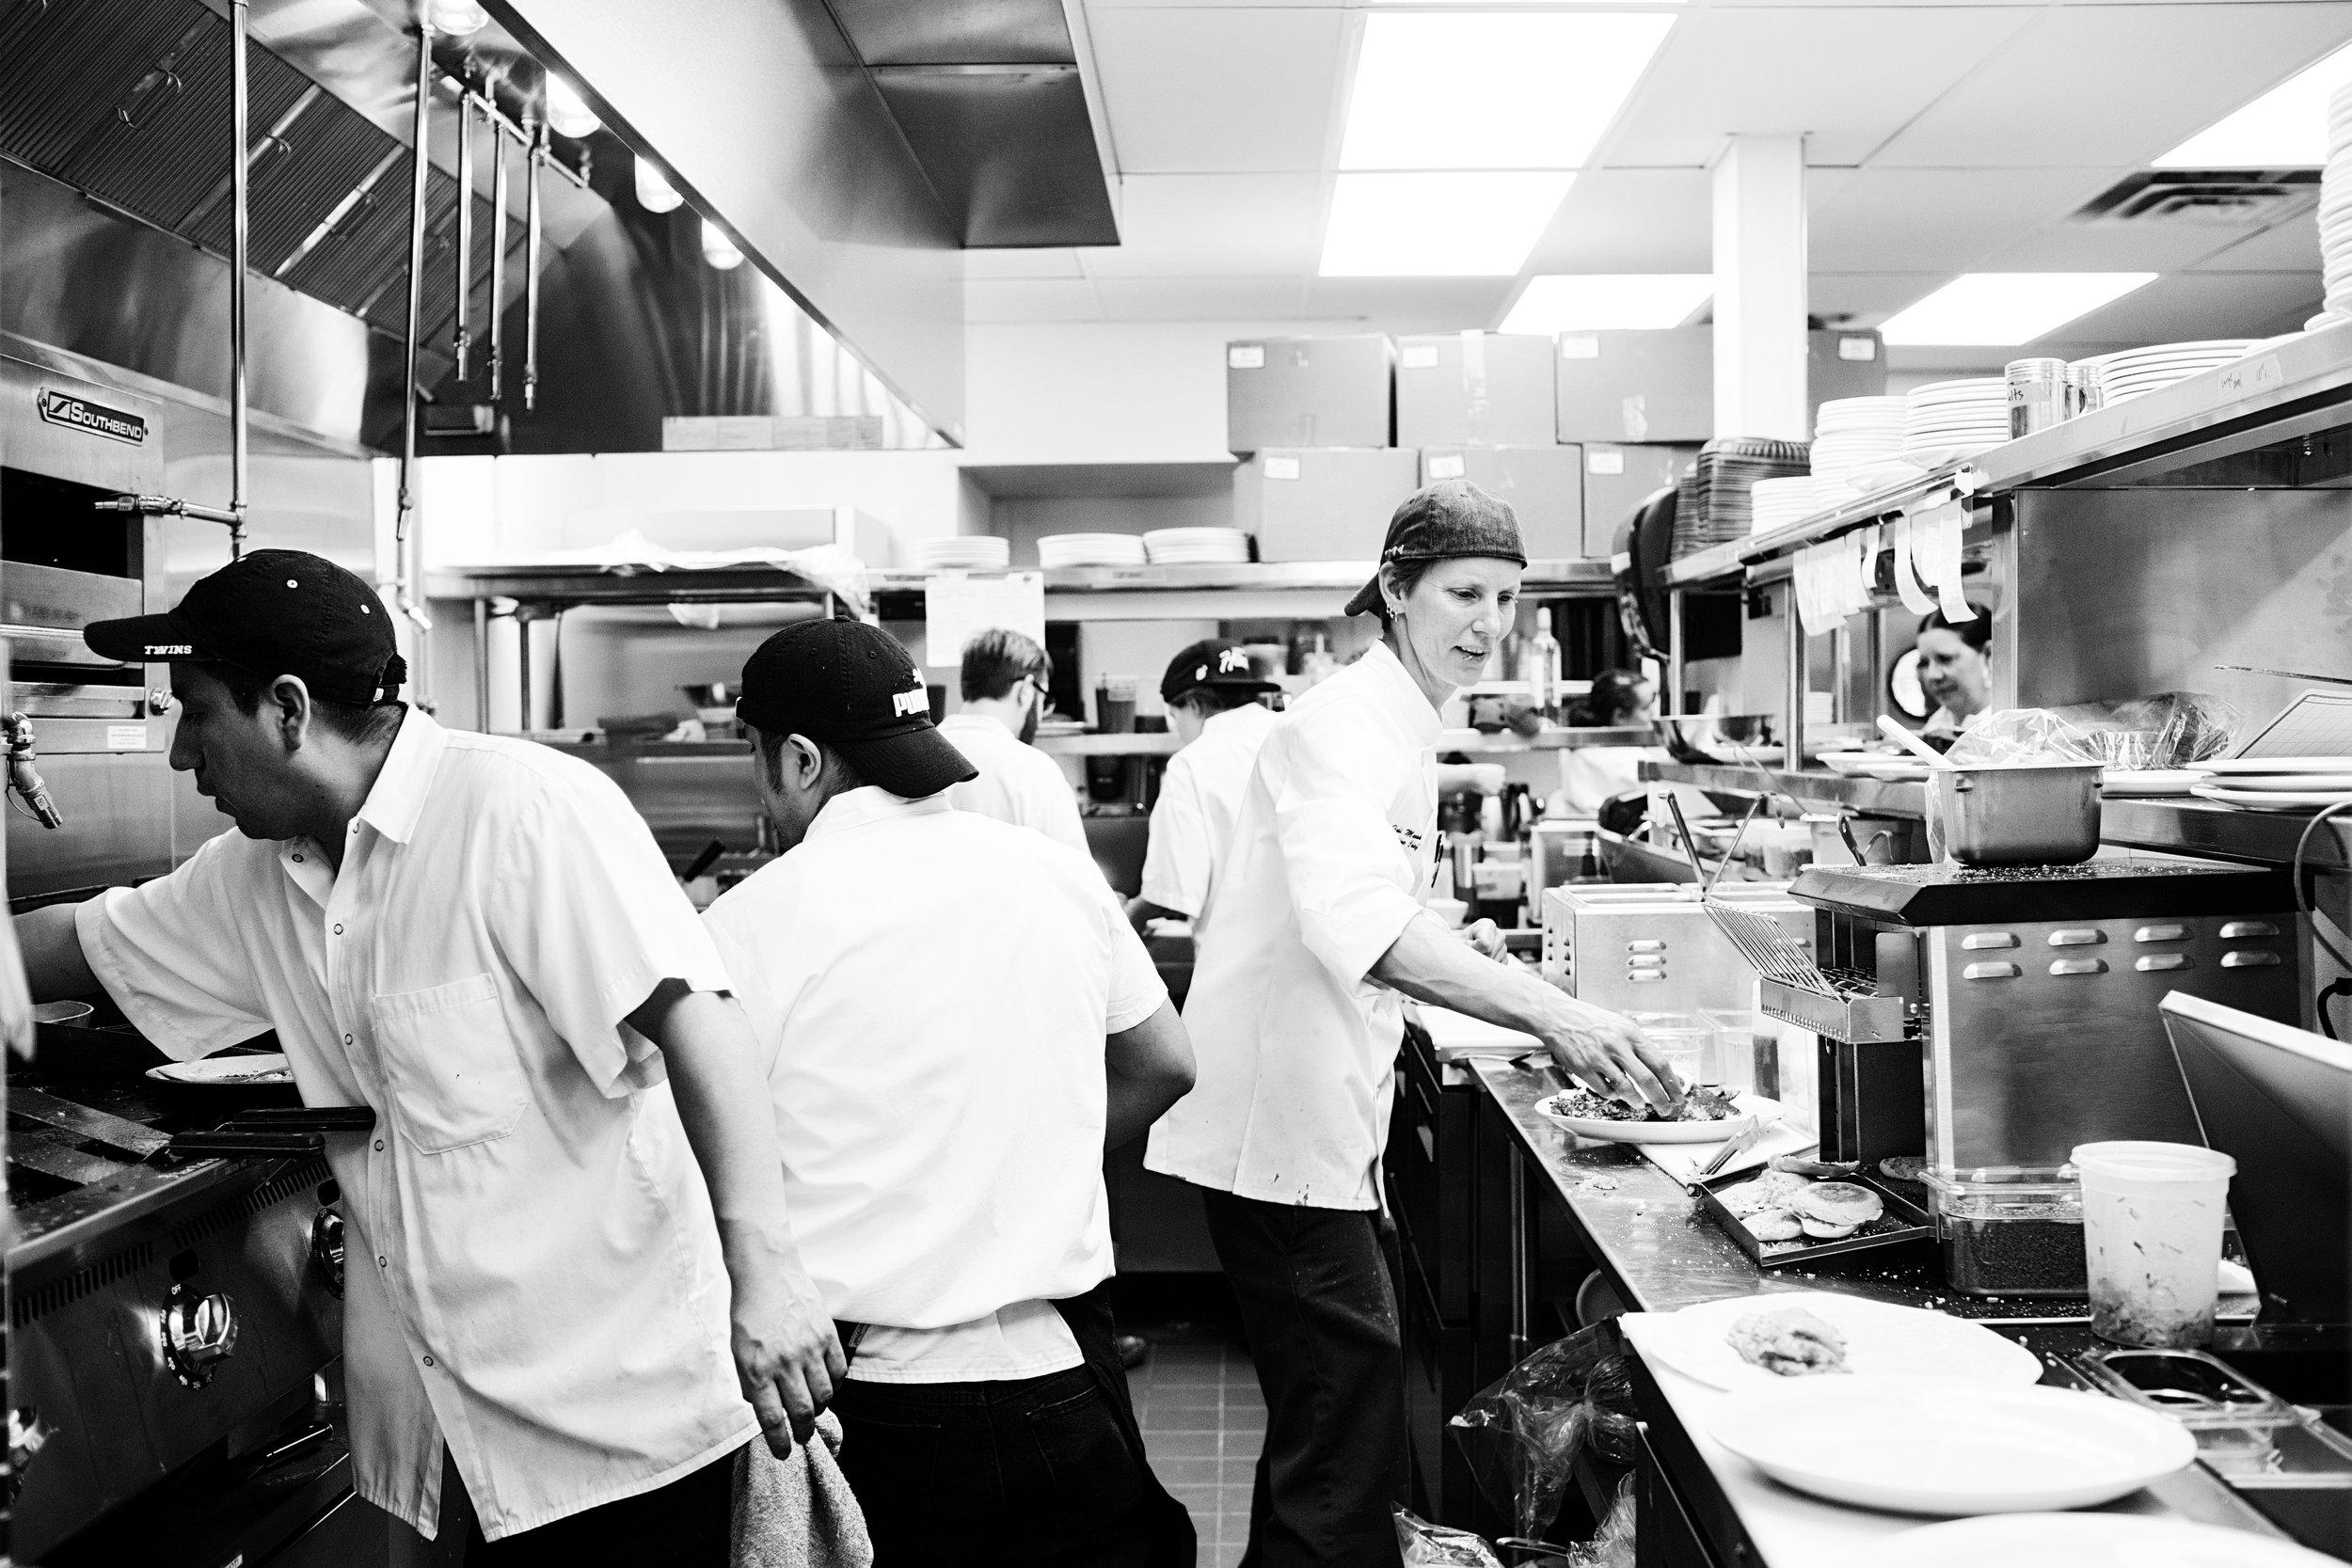 The bustling kitchen | Hi-Lo Diner | The Restaurant Project